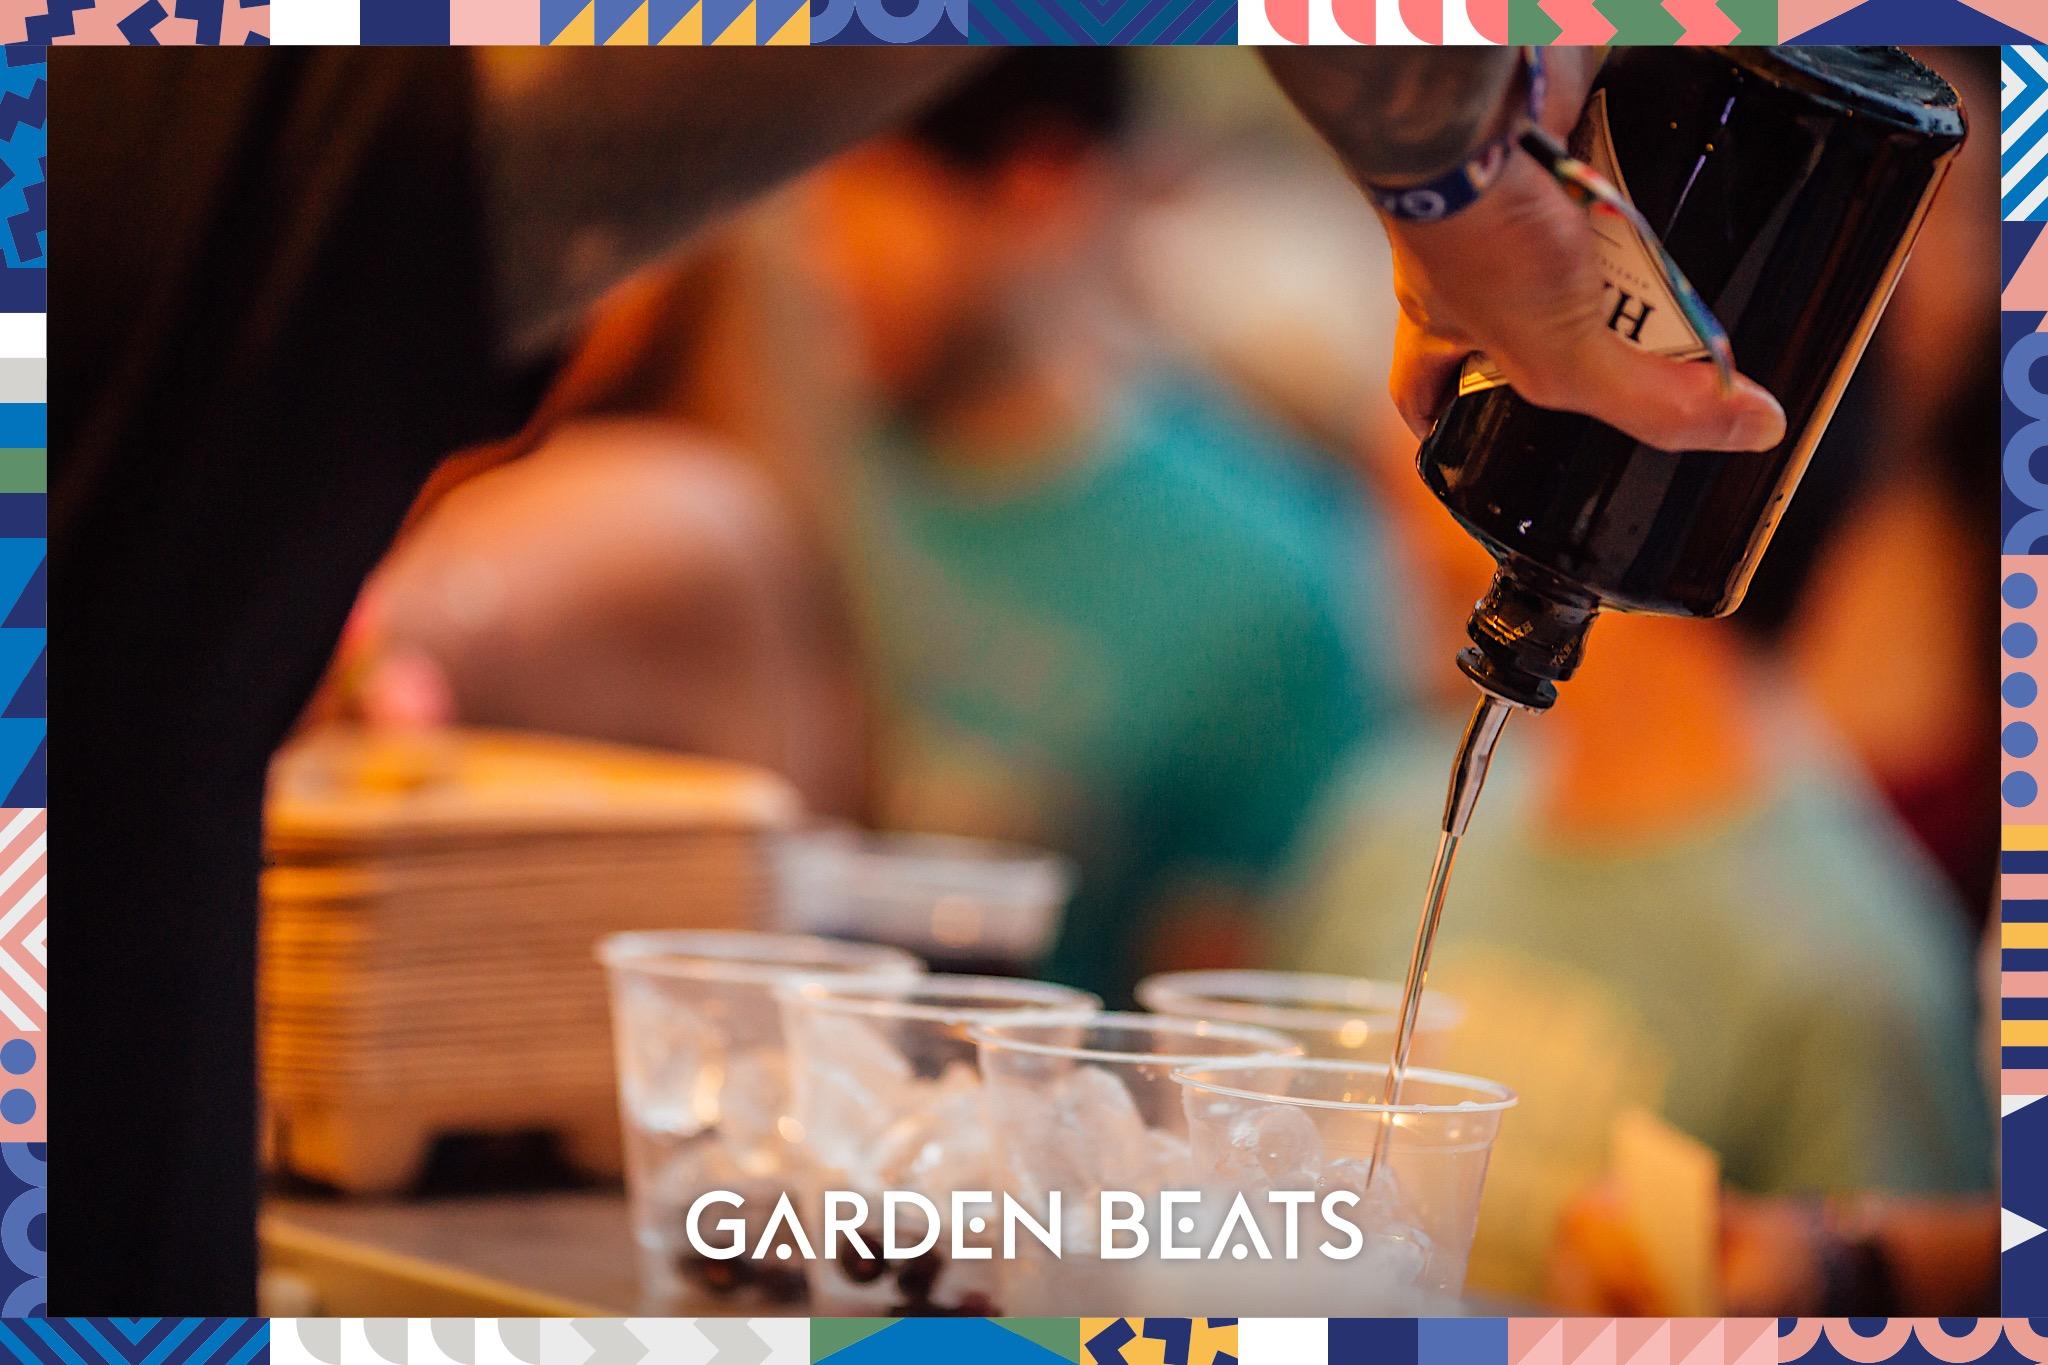 18032017_GardenBeats_Colossal702_WatermarkedGB.jpg